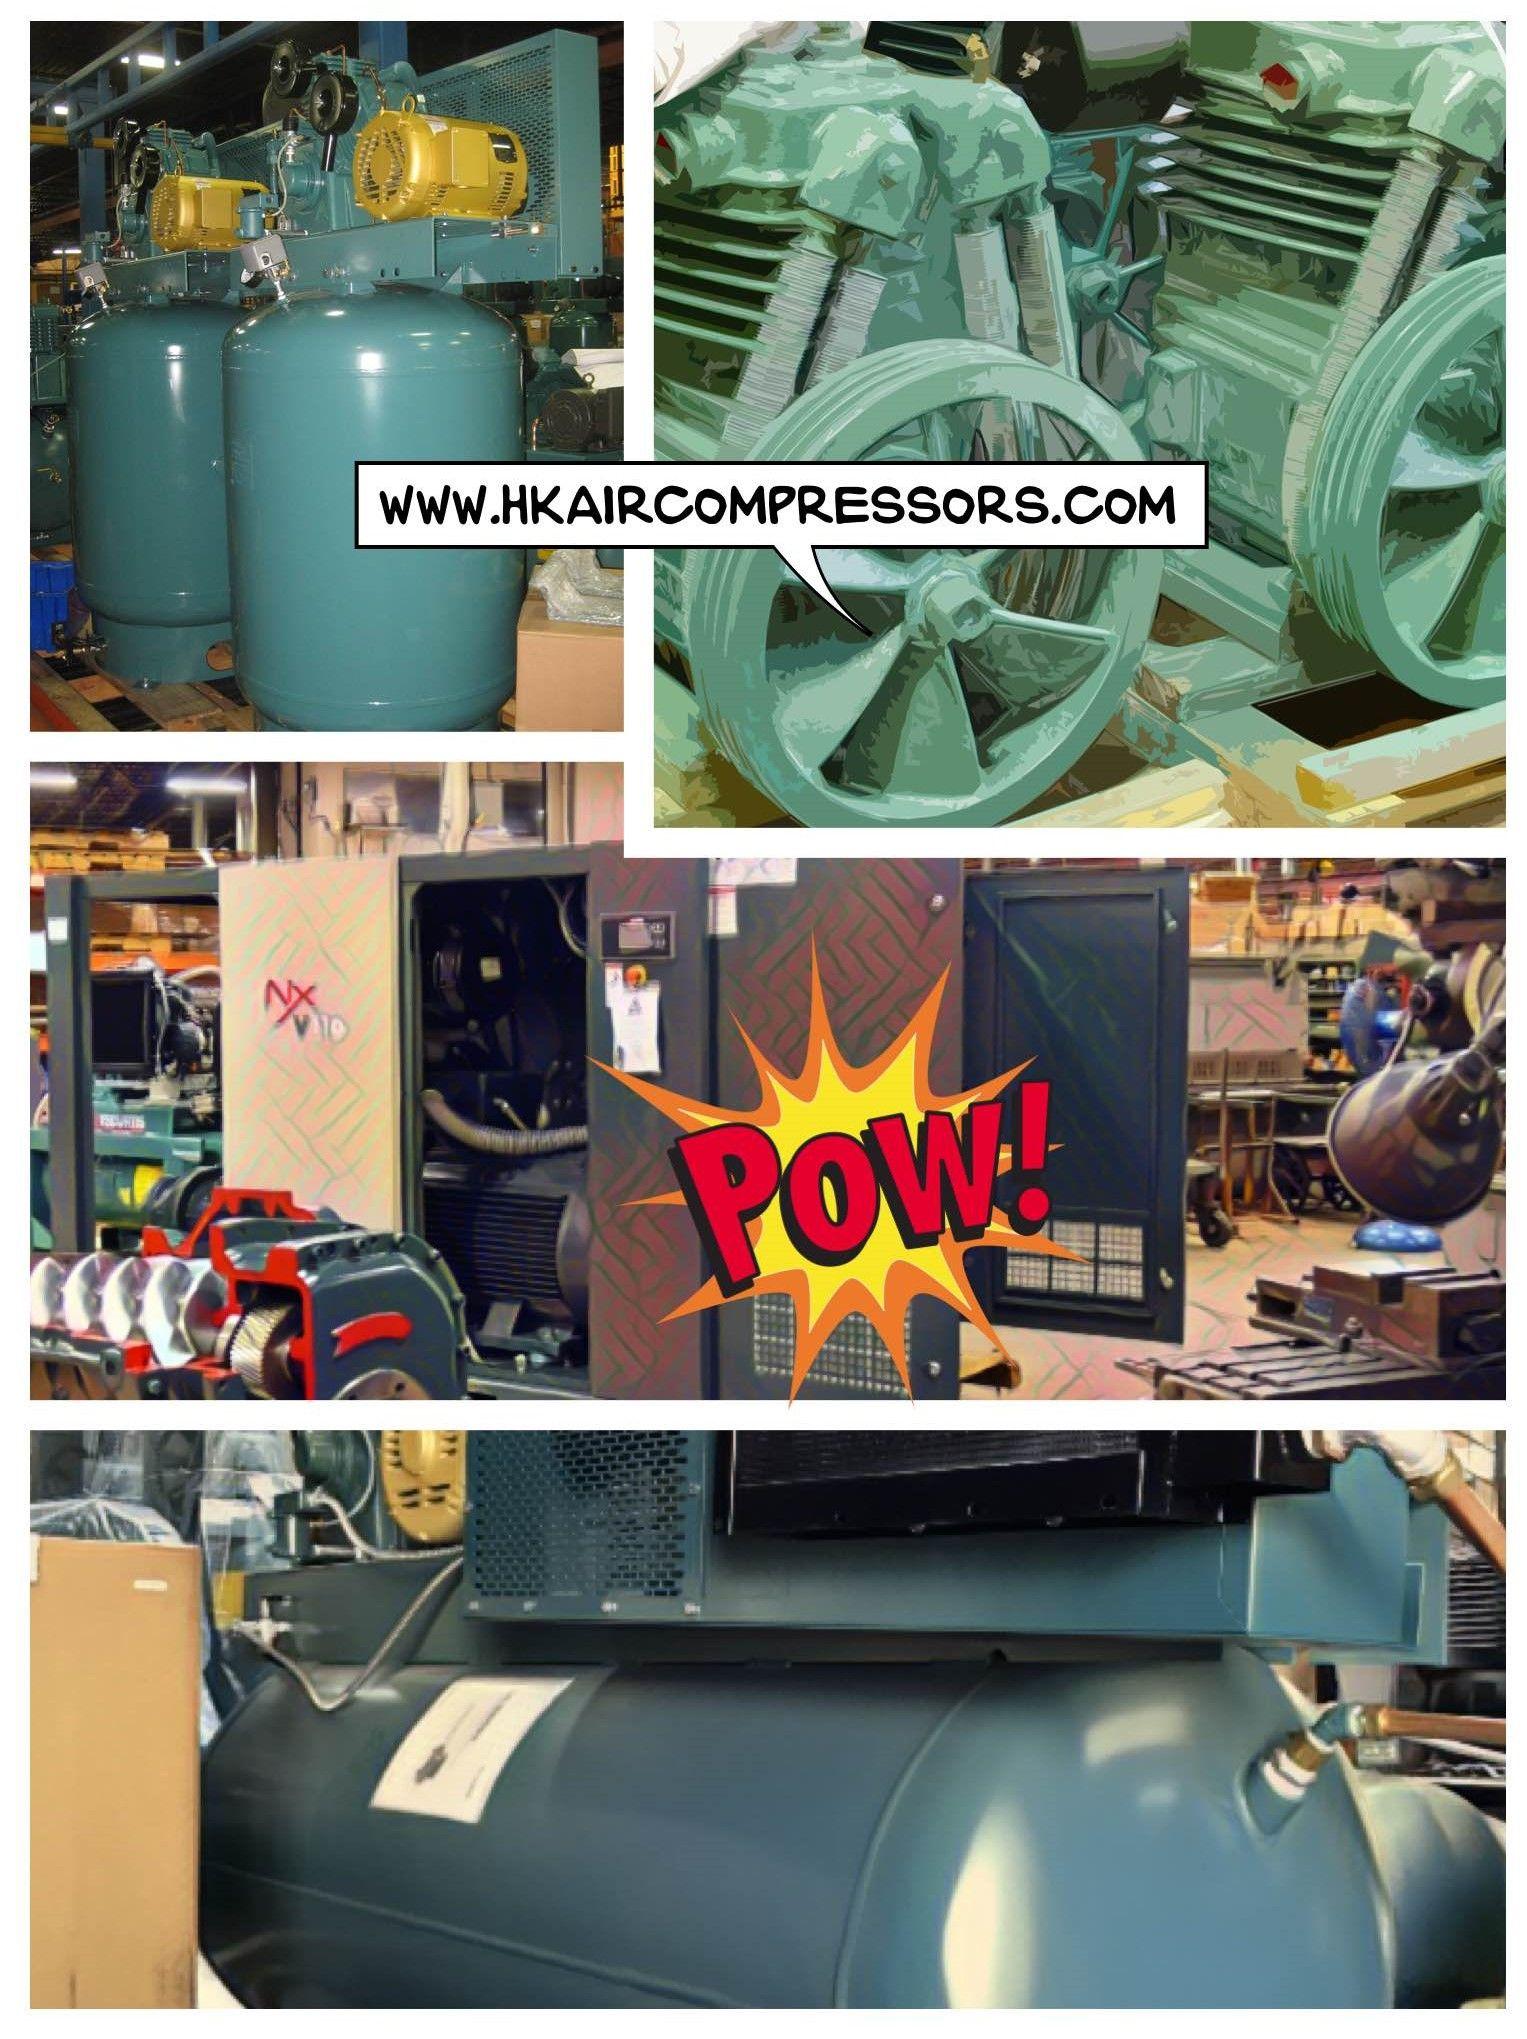 air compressors Air compressor, Compressor, Compressors